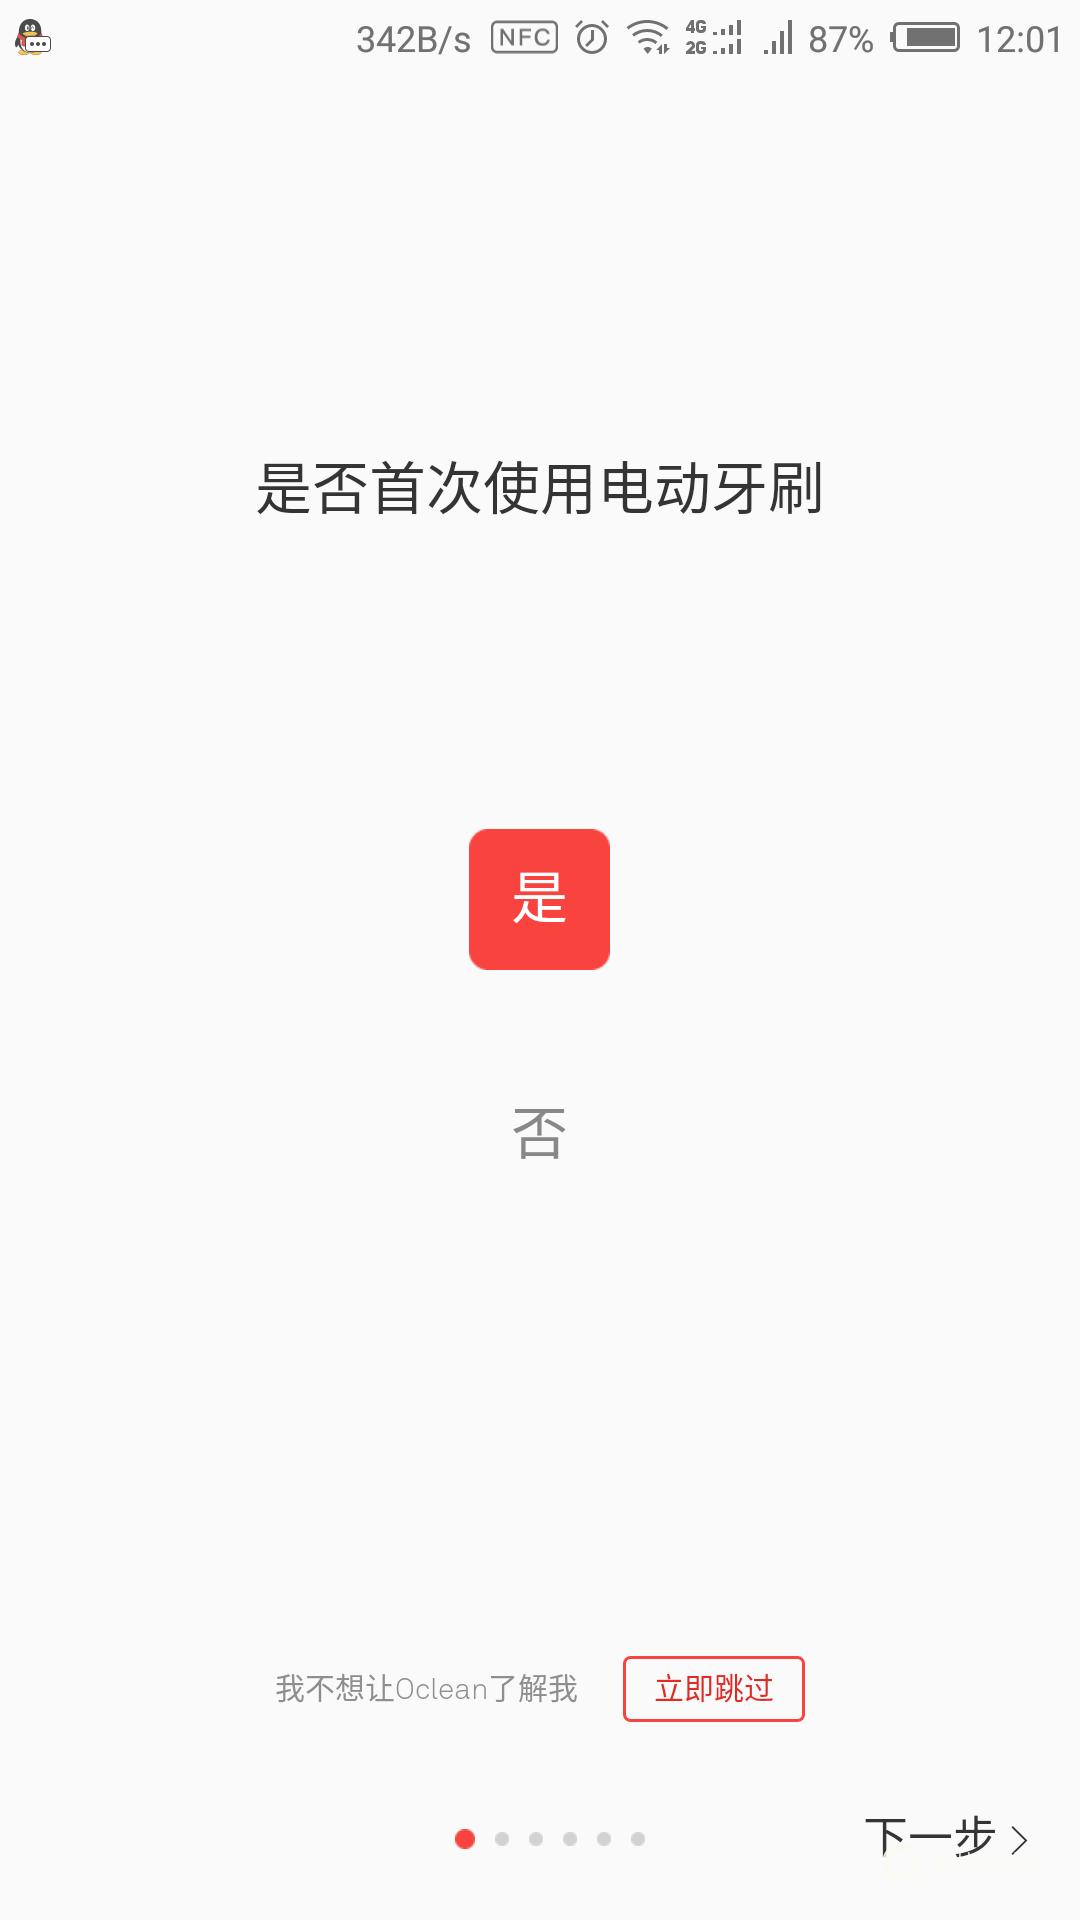 Screenshot_2018-01-07-12-01-11.png